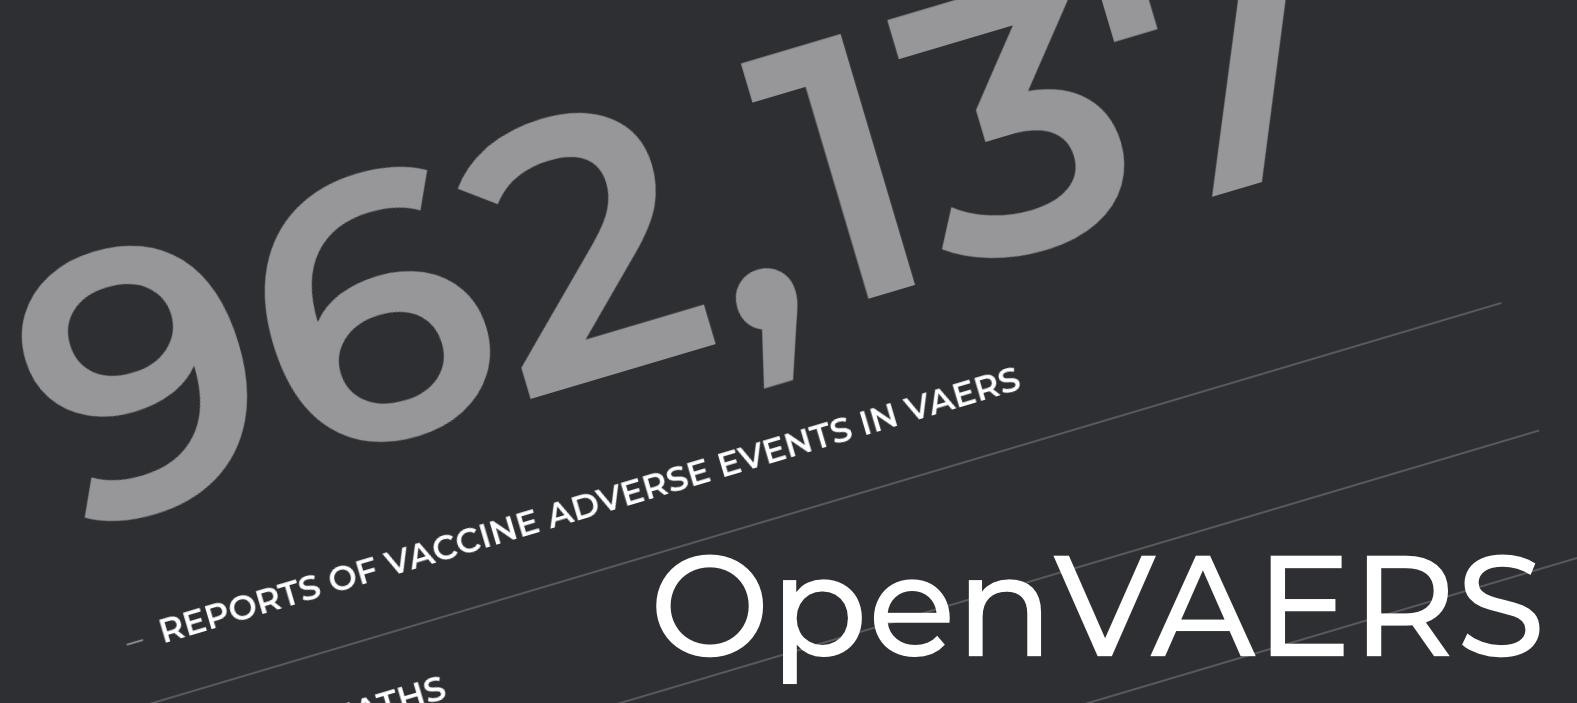 www.openvaers.com